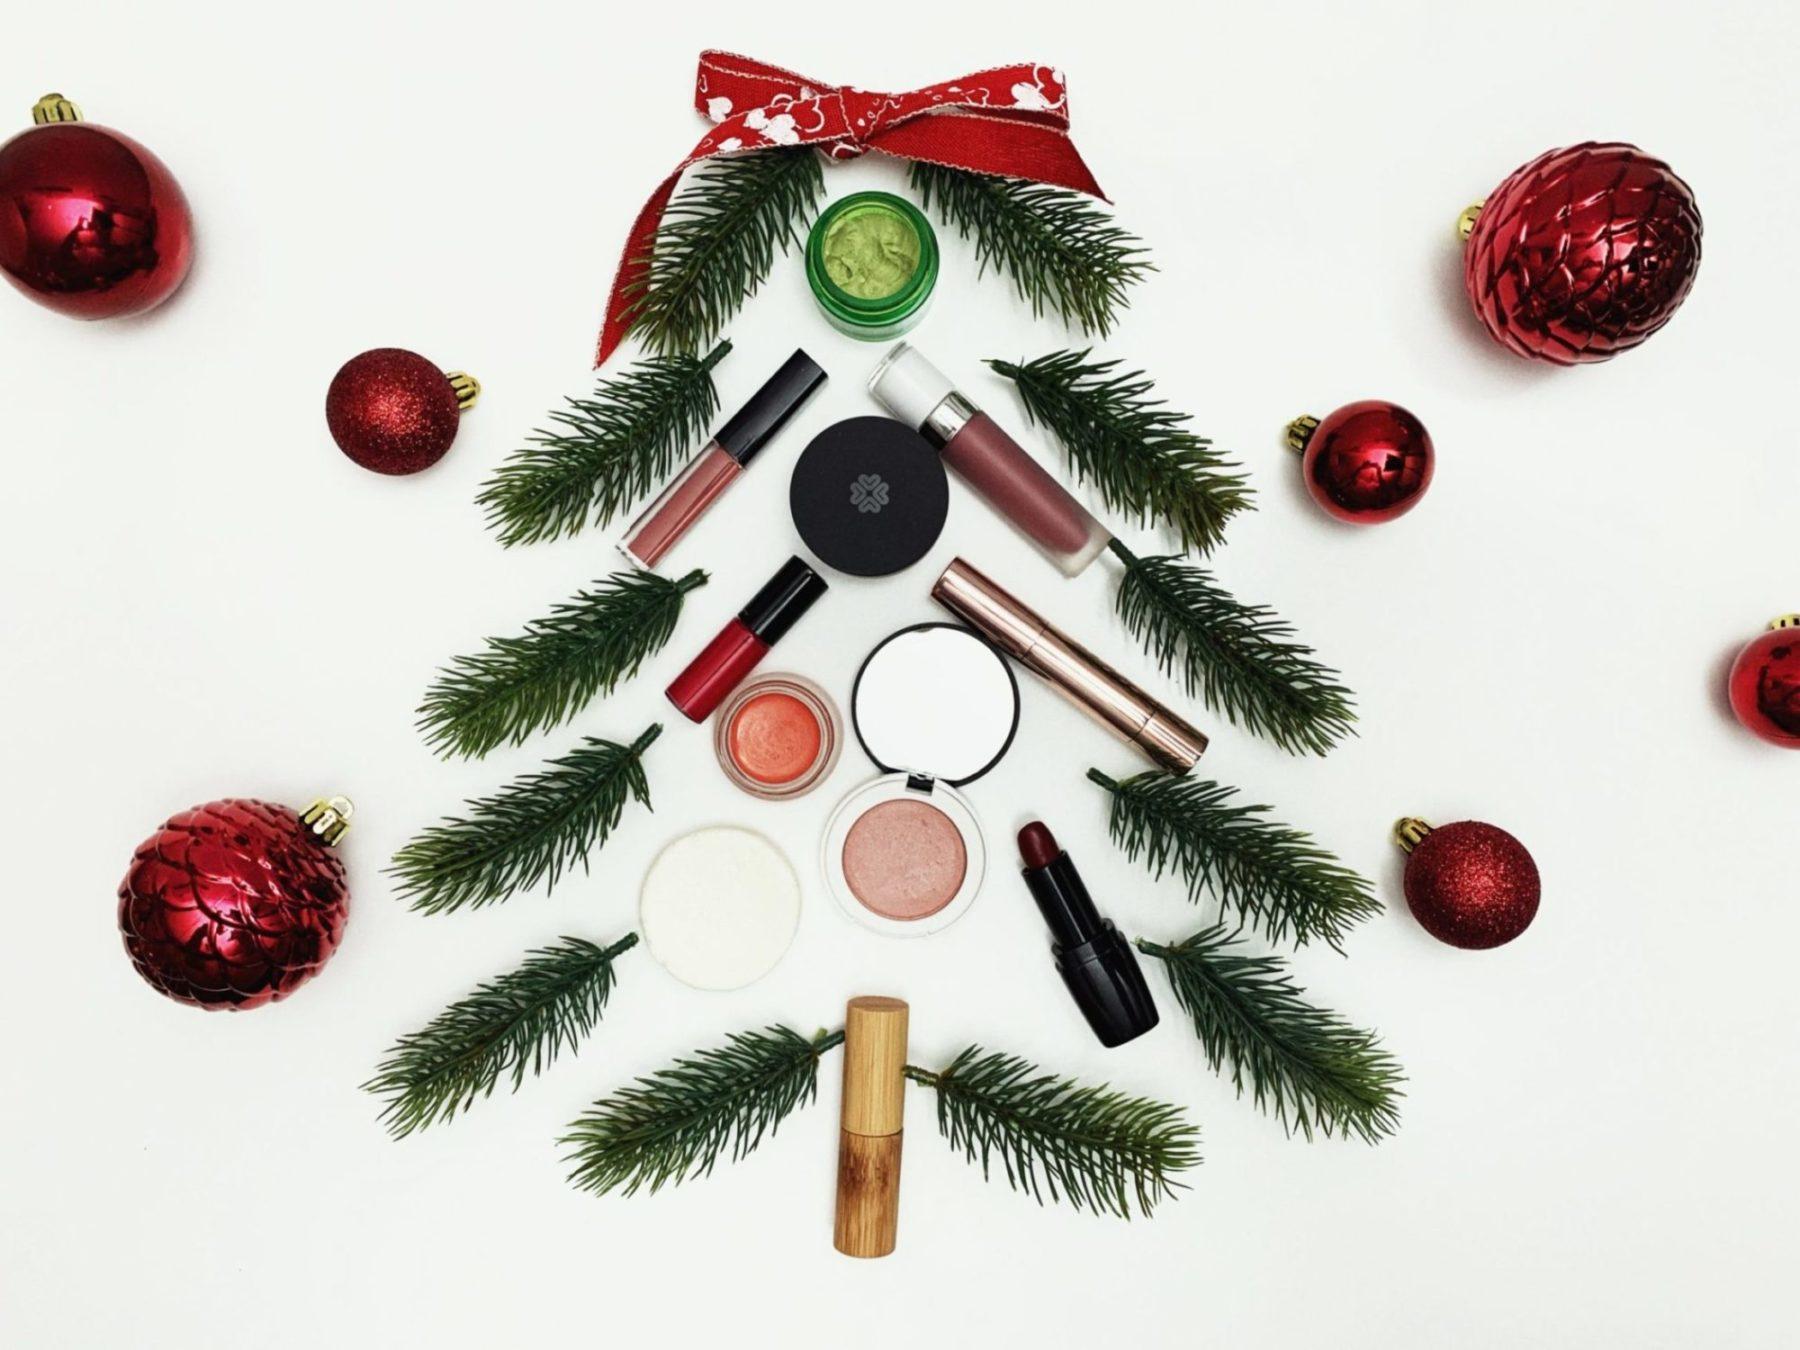 Der ultimative Beauty Weihnachtsgeschenke Guide | vegan & tierversuchsfrei